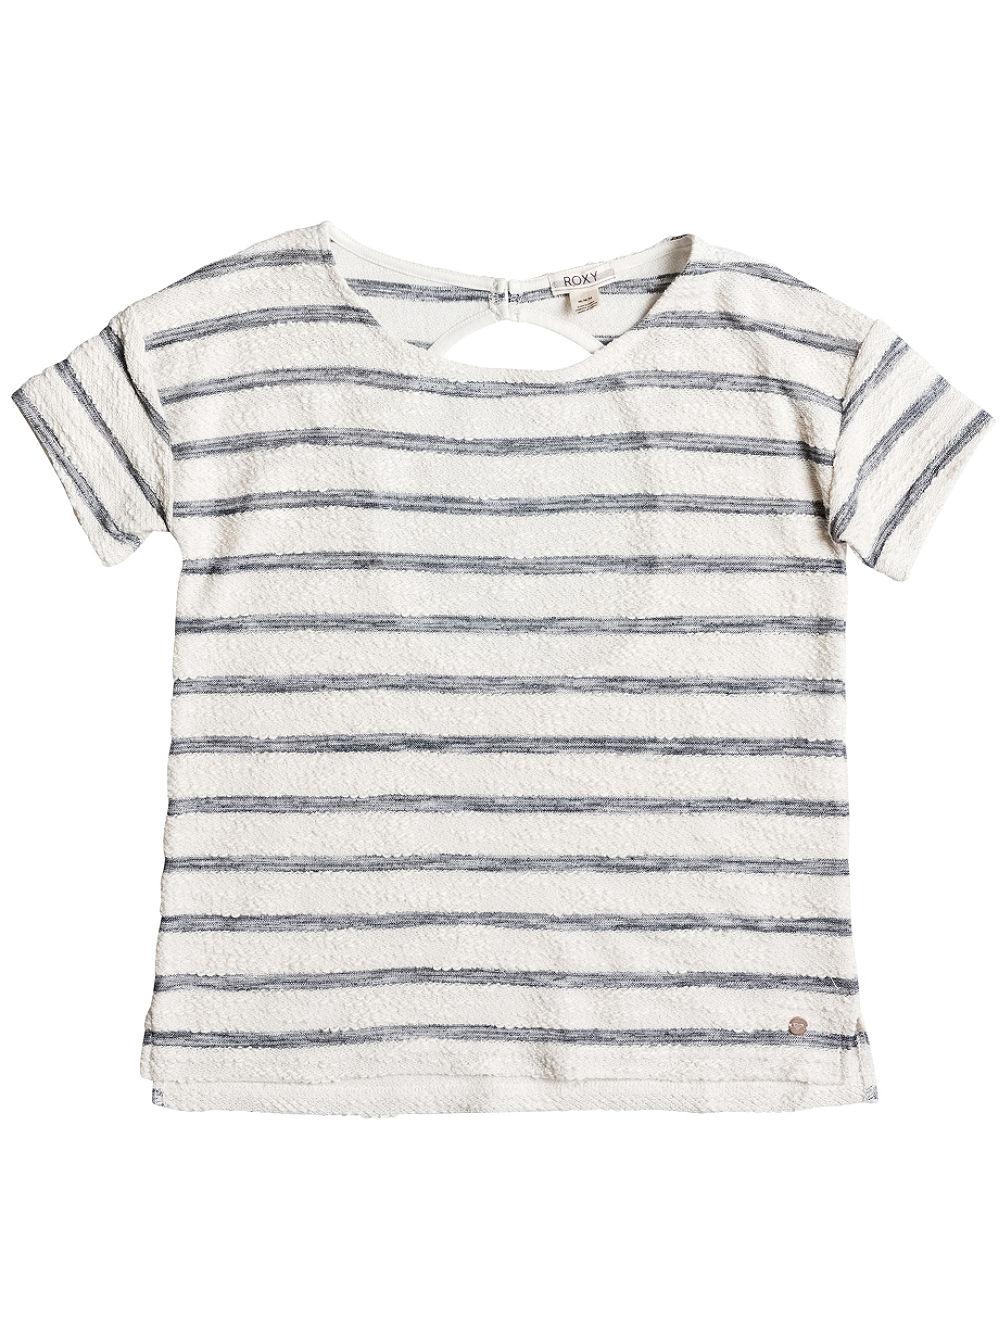 adelaide-t-shirt